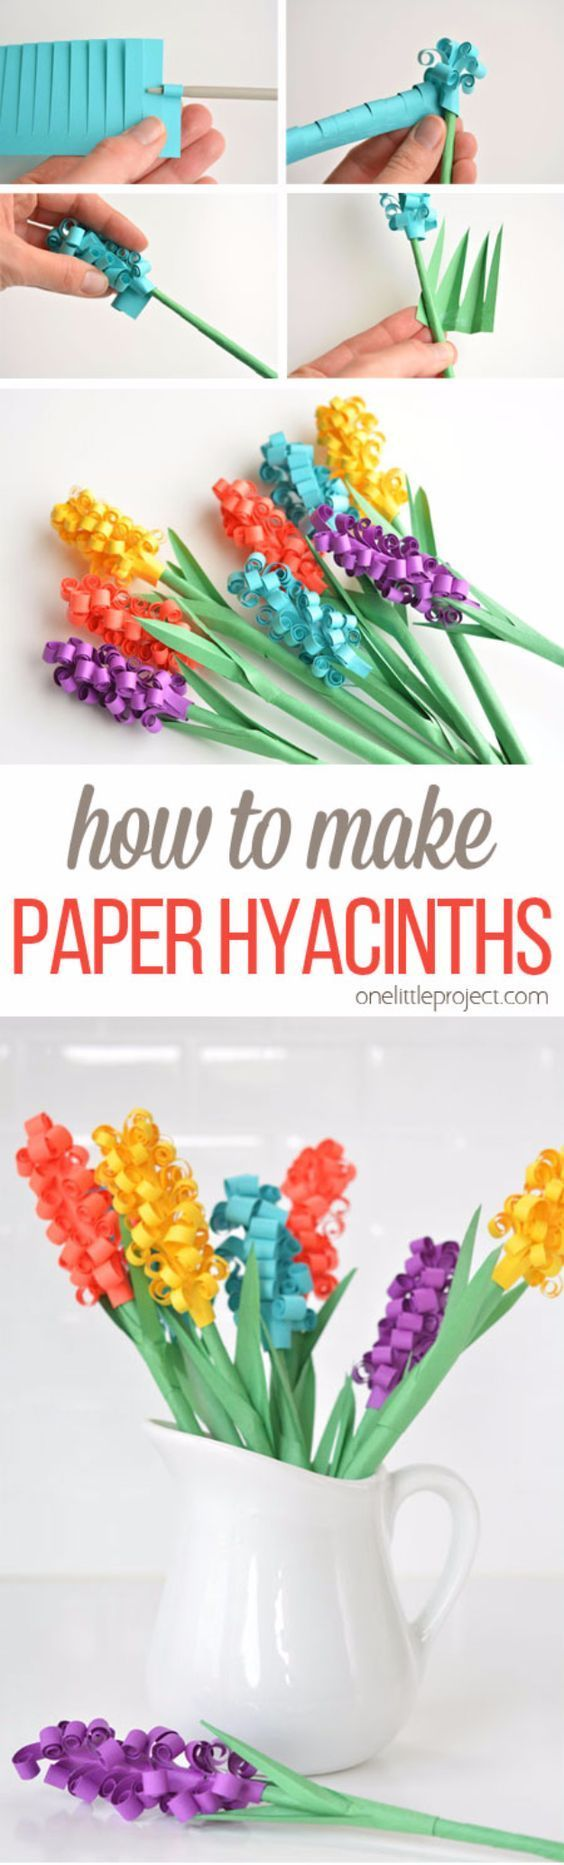 41 Easiest DIY Projects Ever - Paper Hyacinth Flowers - Easy DIY ...